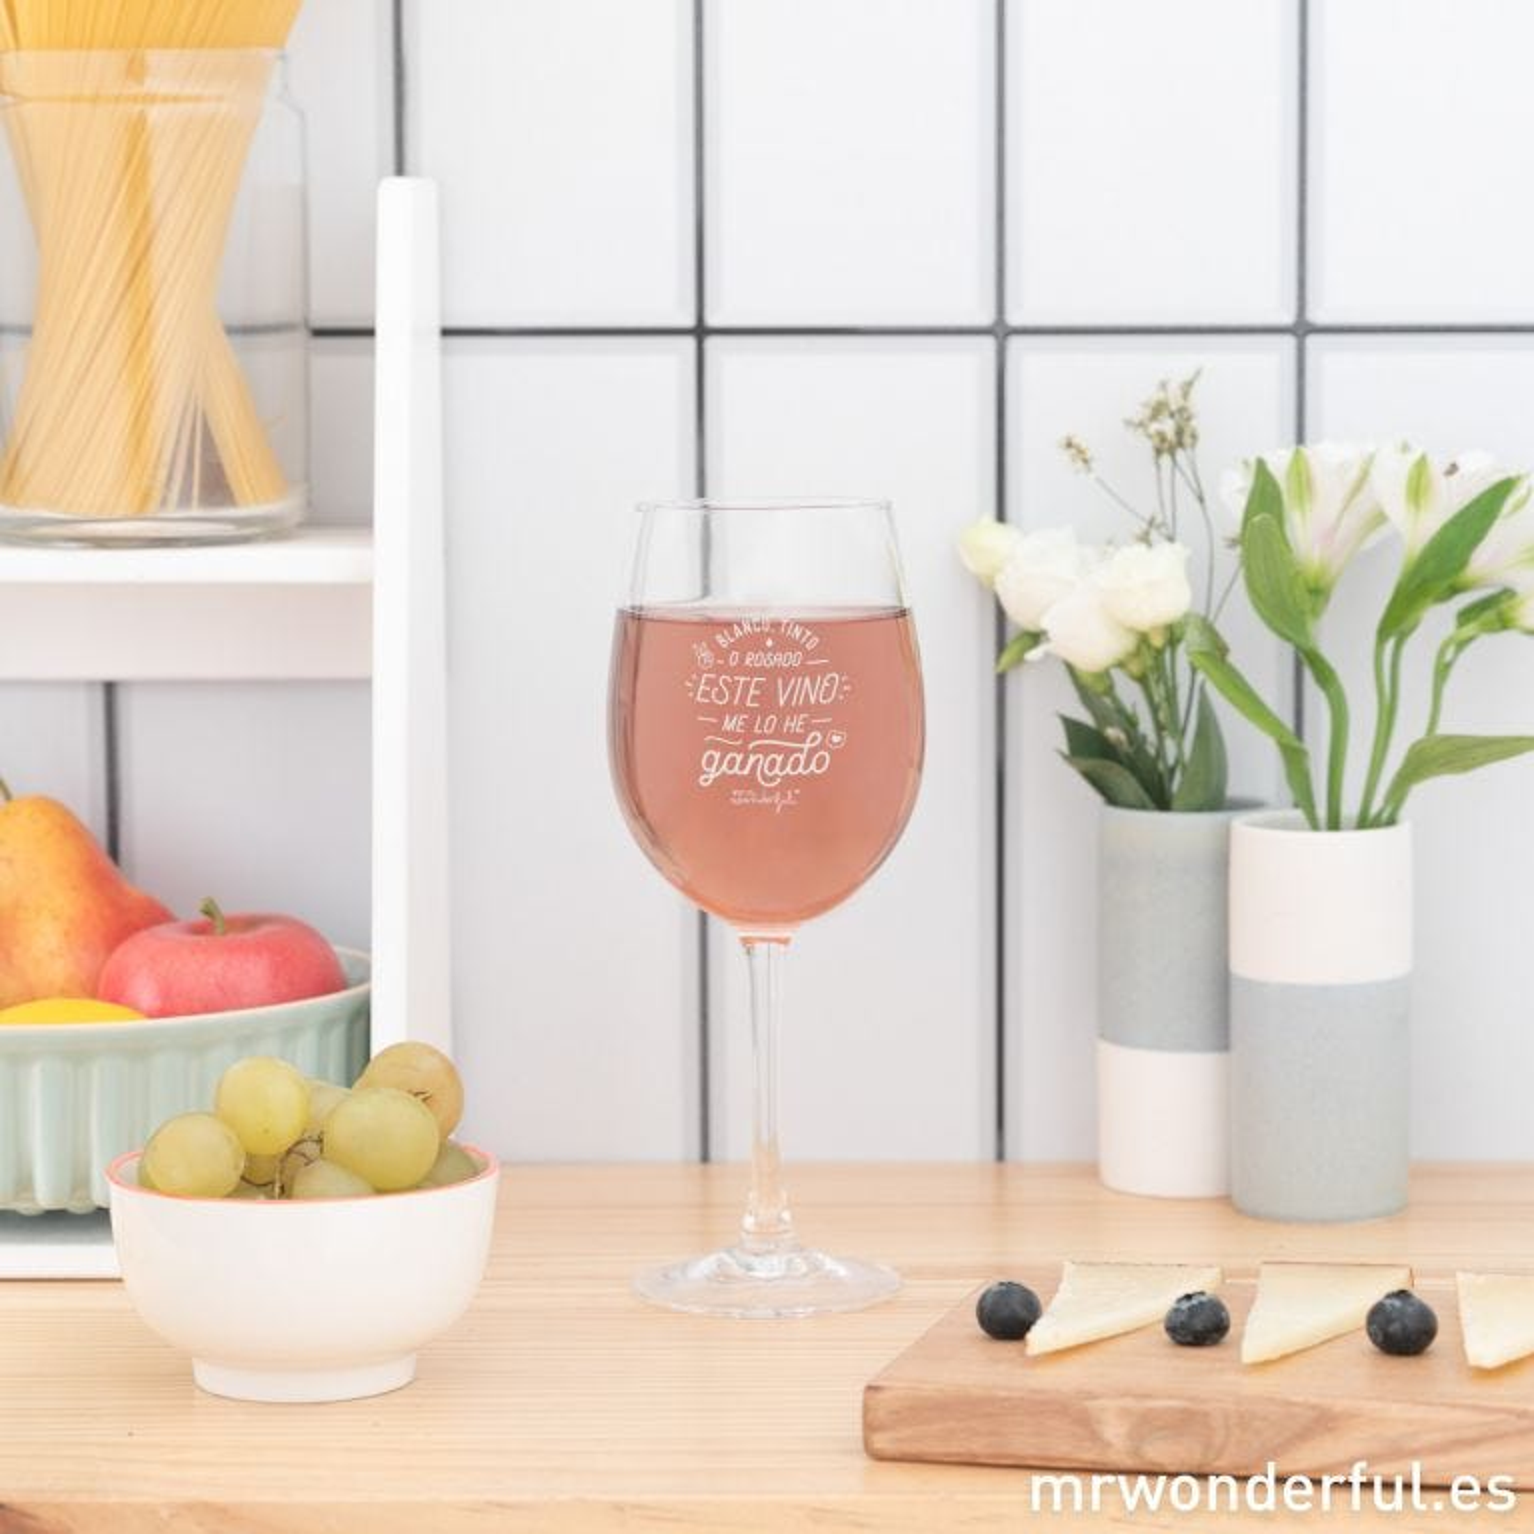 Copa de vino - Blanco, tinto o rosado, este vino me lo he ganado